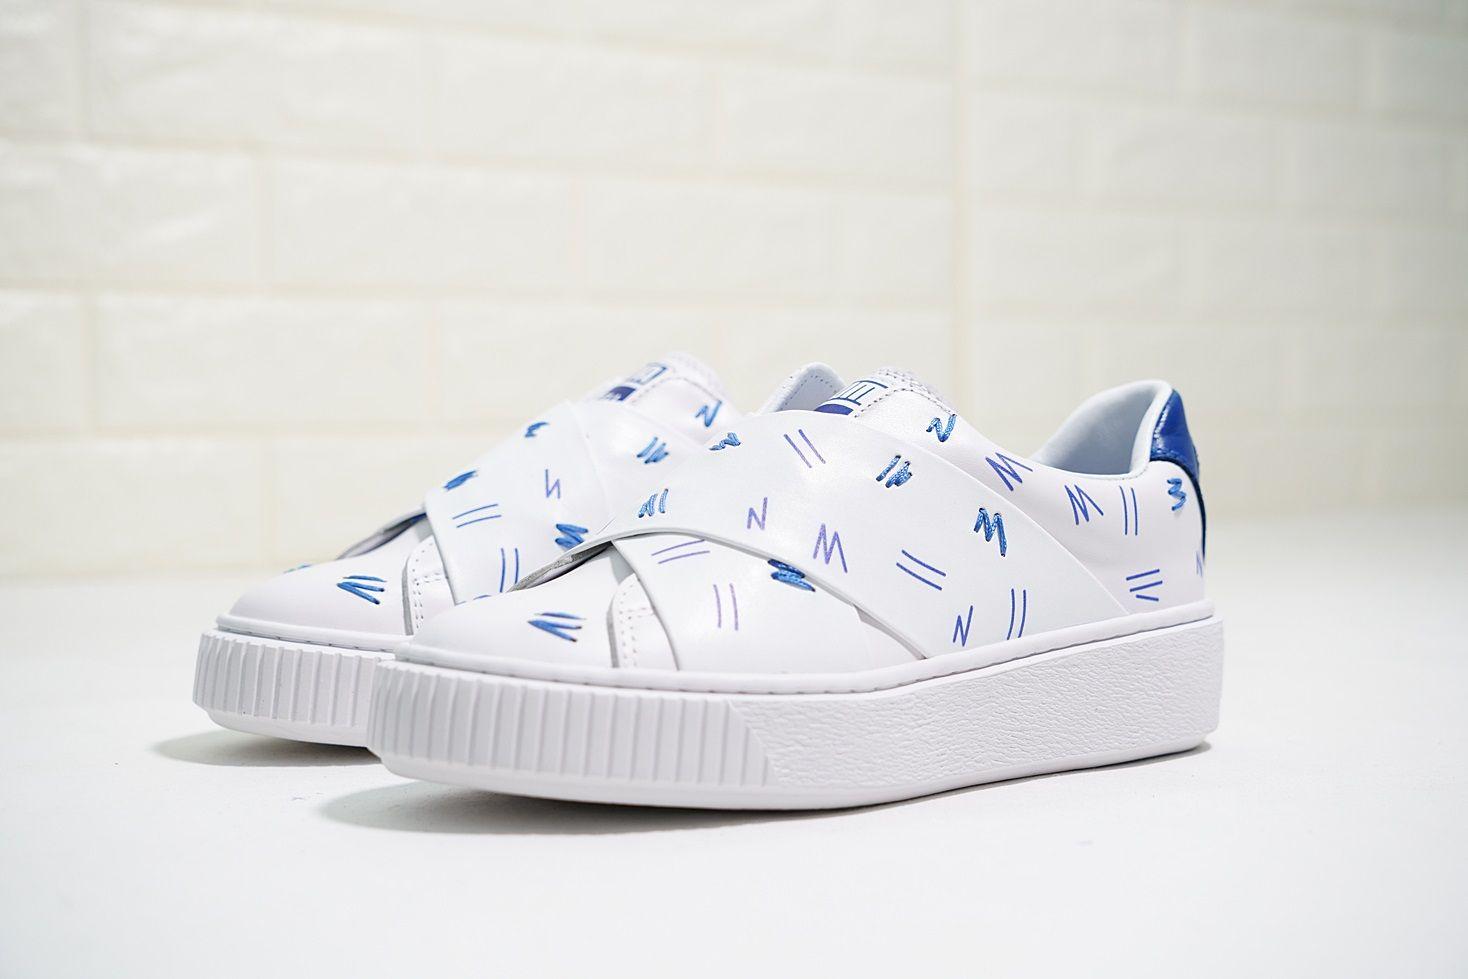 85246a3b3ee 2018 Shantell Martin X Platform Slip-On Low Shoes Women Fashion ...